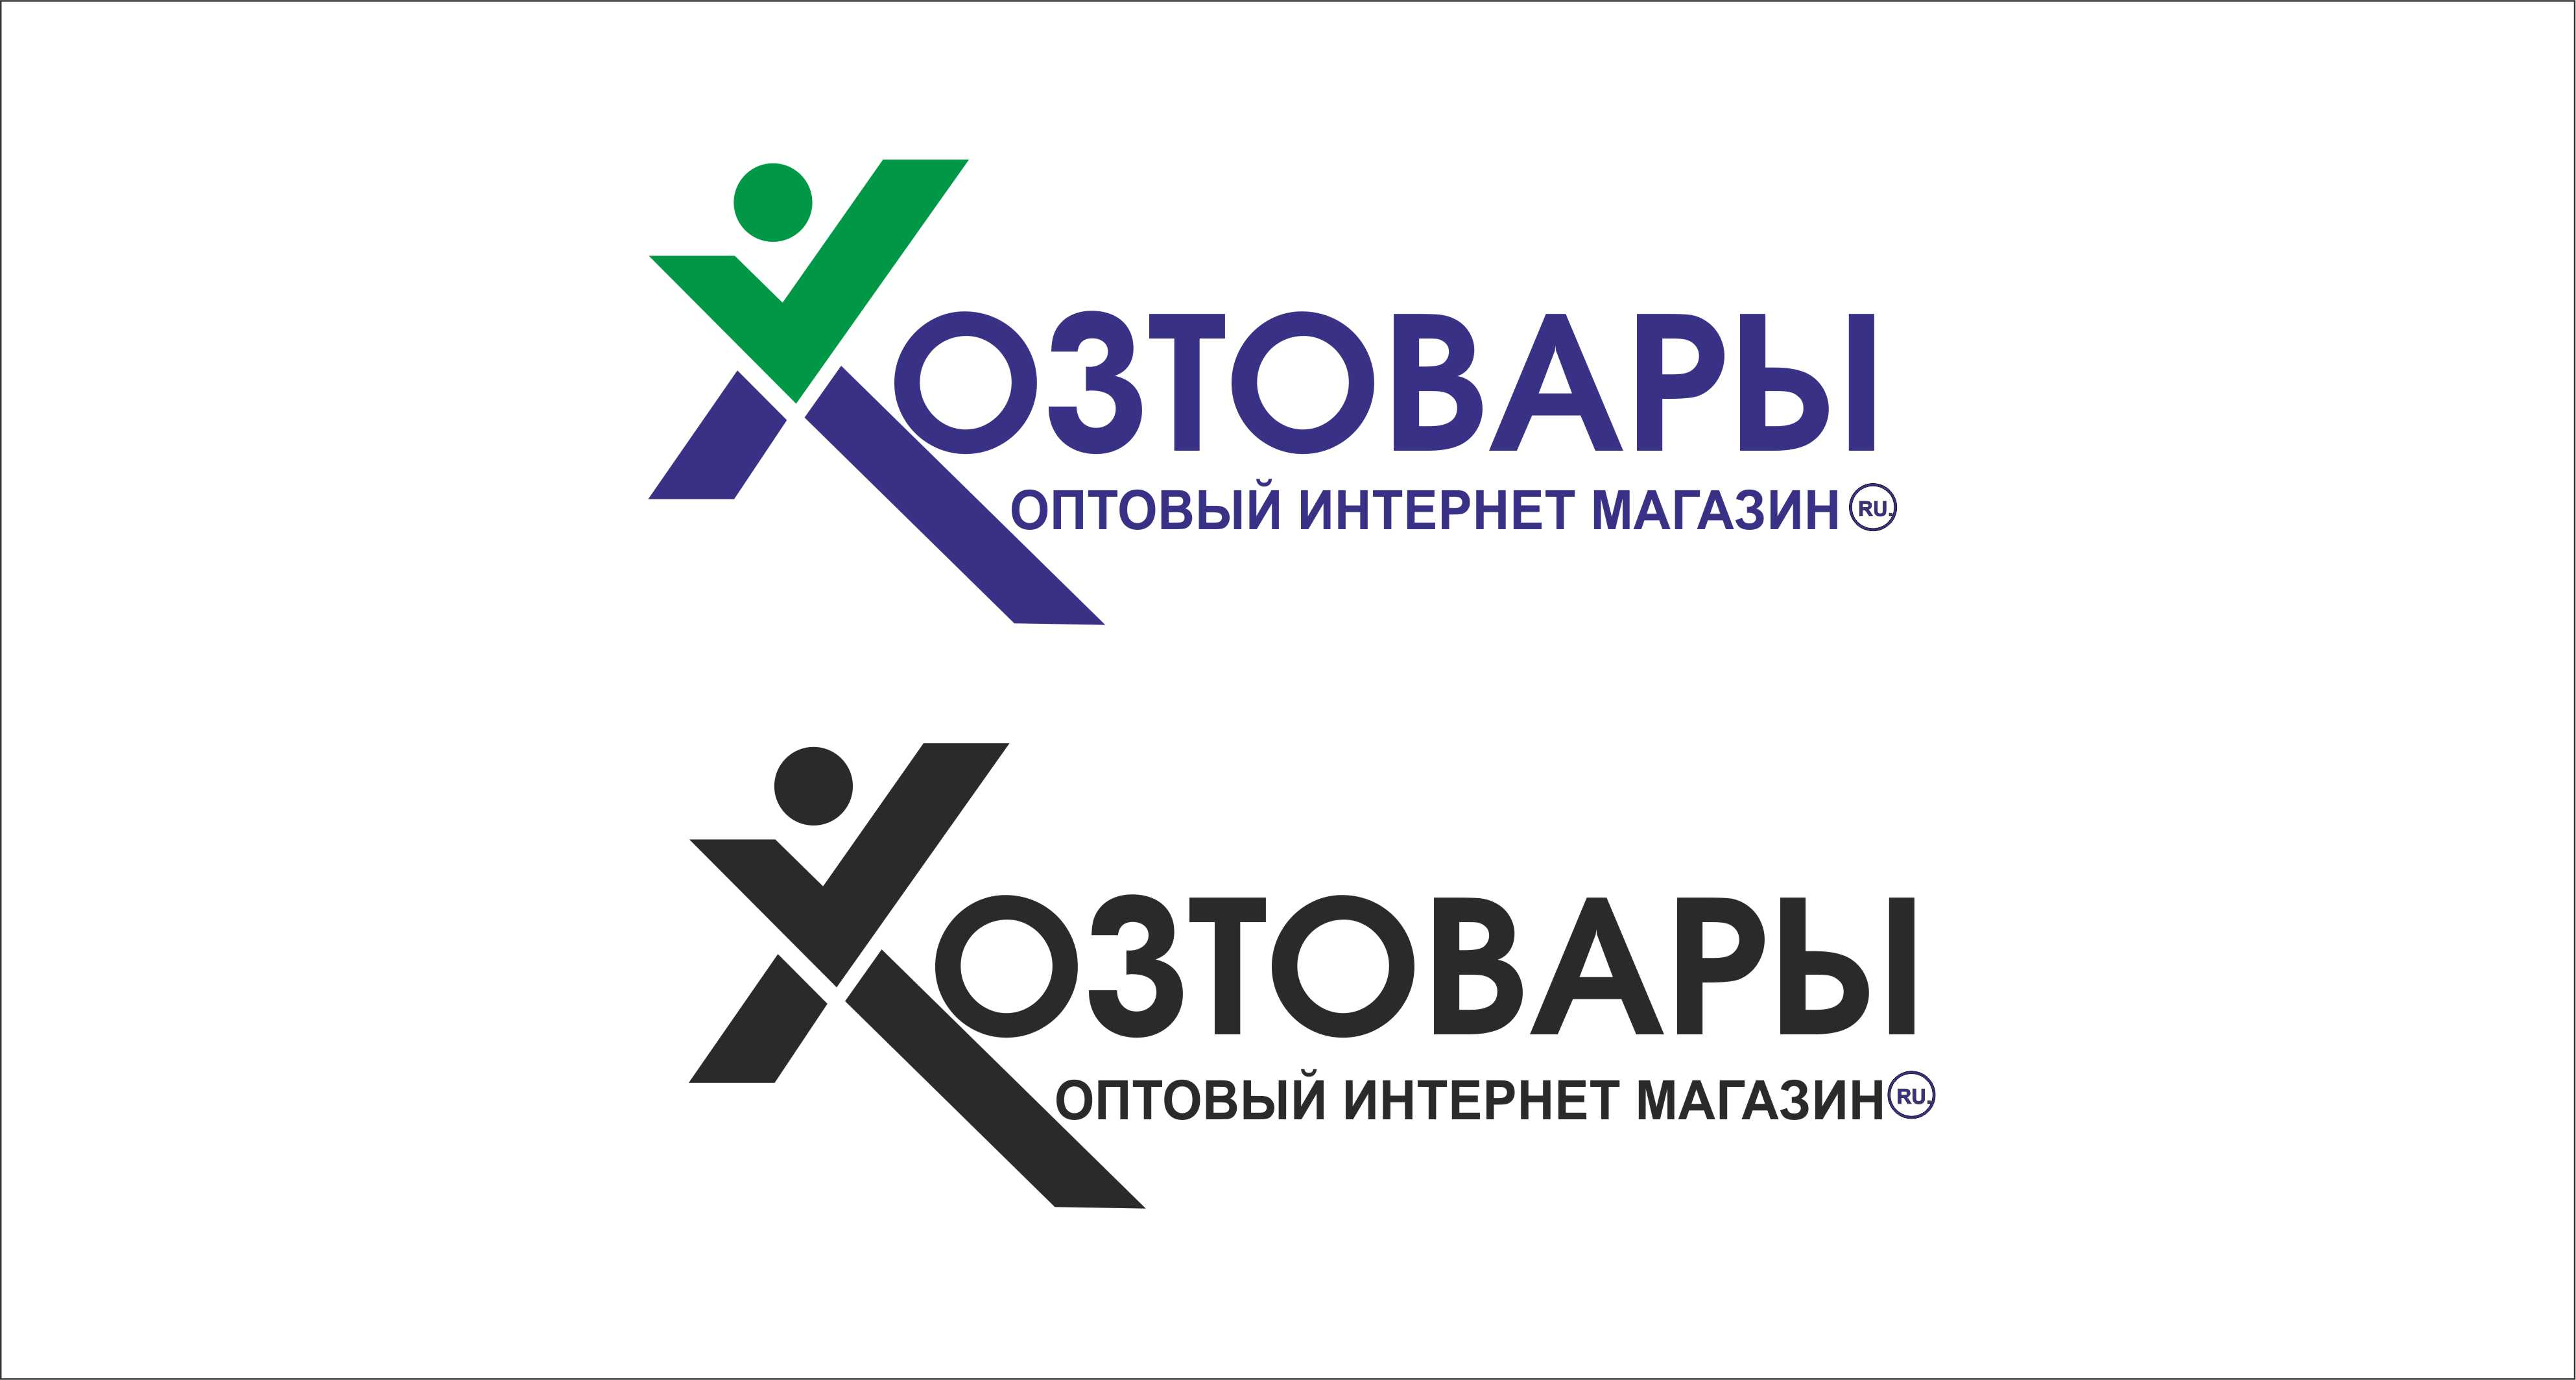 Разработка логотипа для оптового интернет-магазина «Хозтовары.ру» фото f_26560731553a31db.jpg